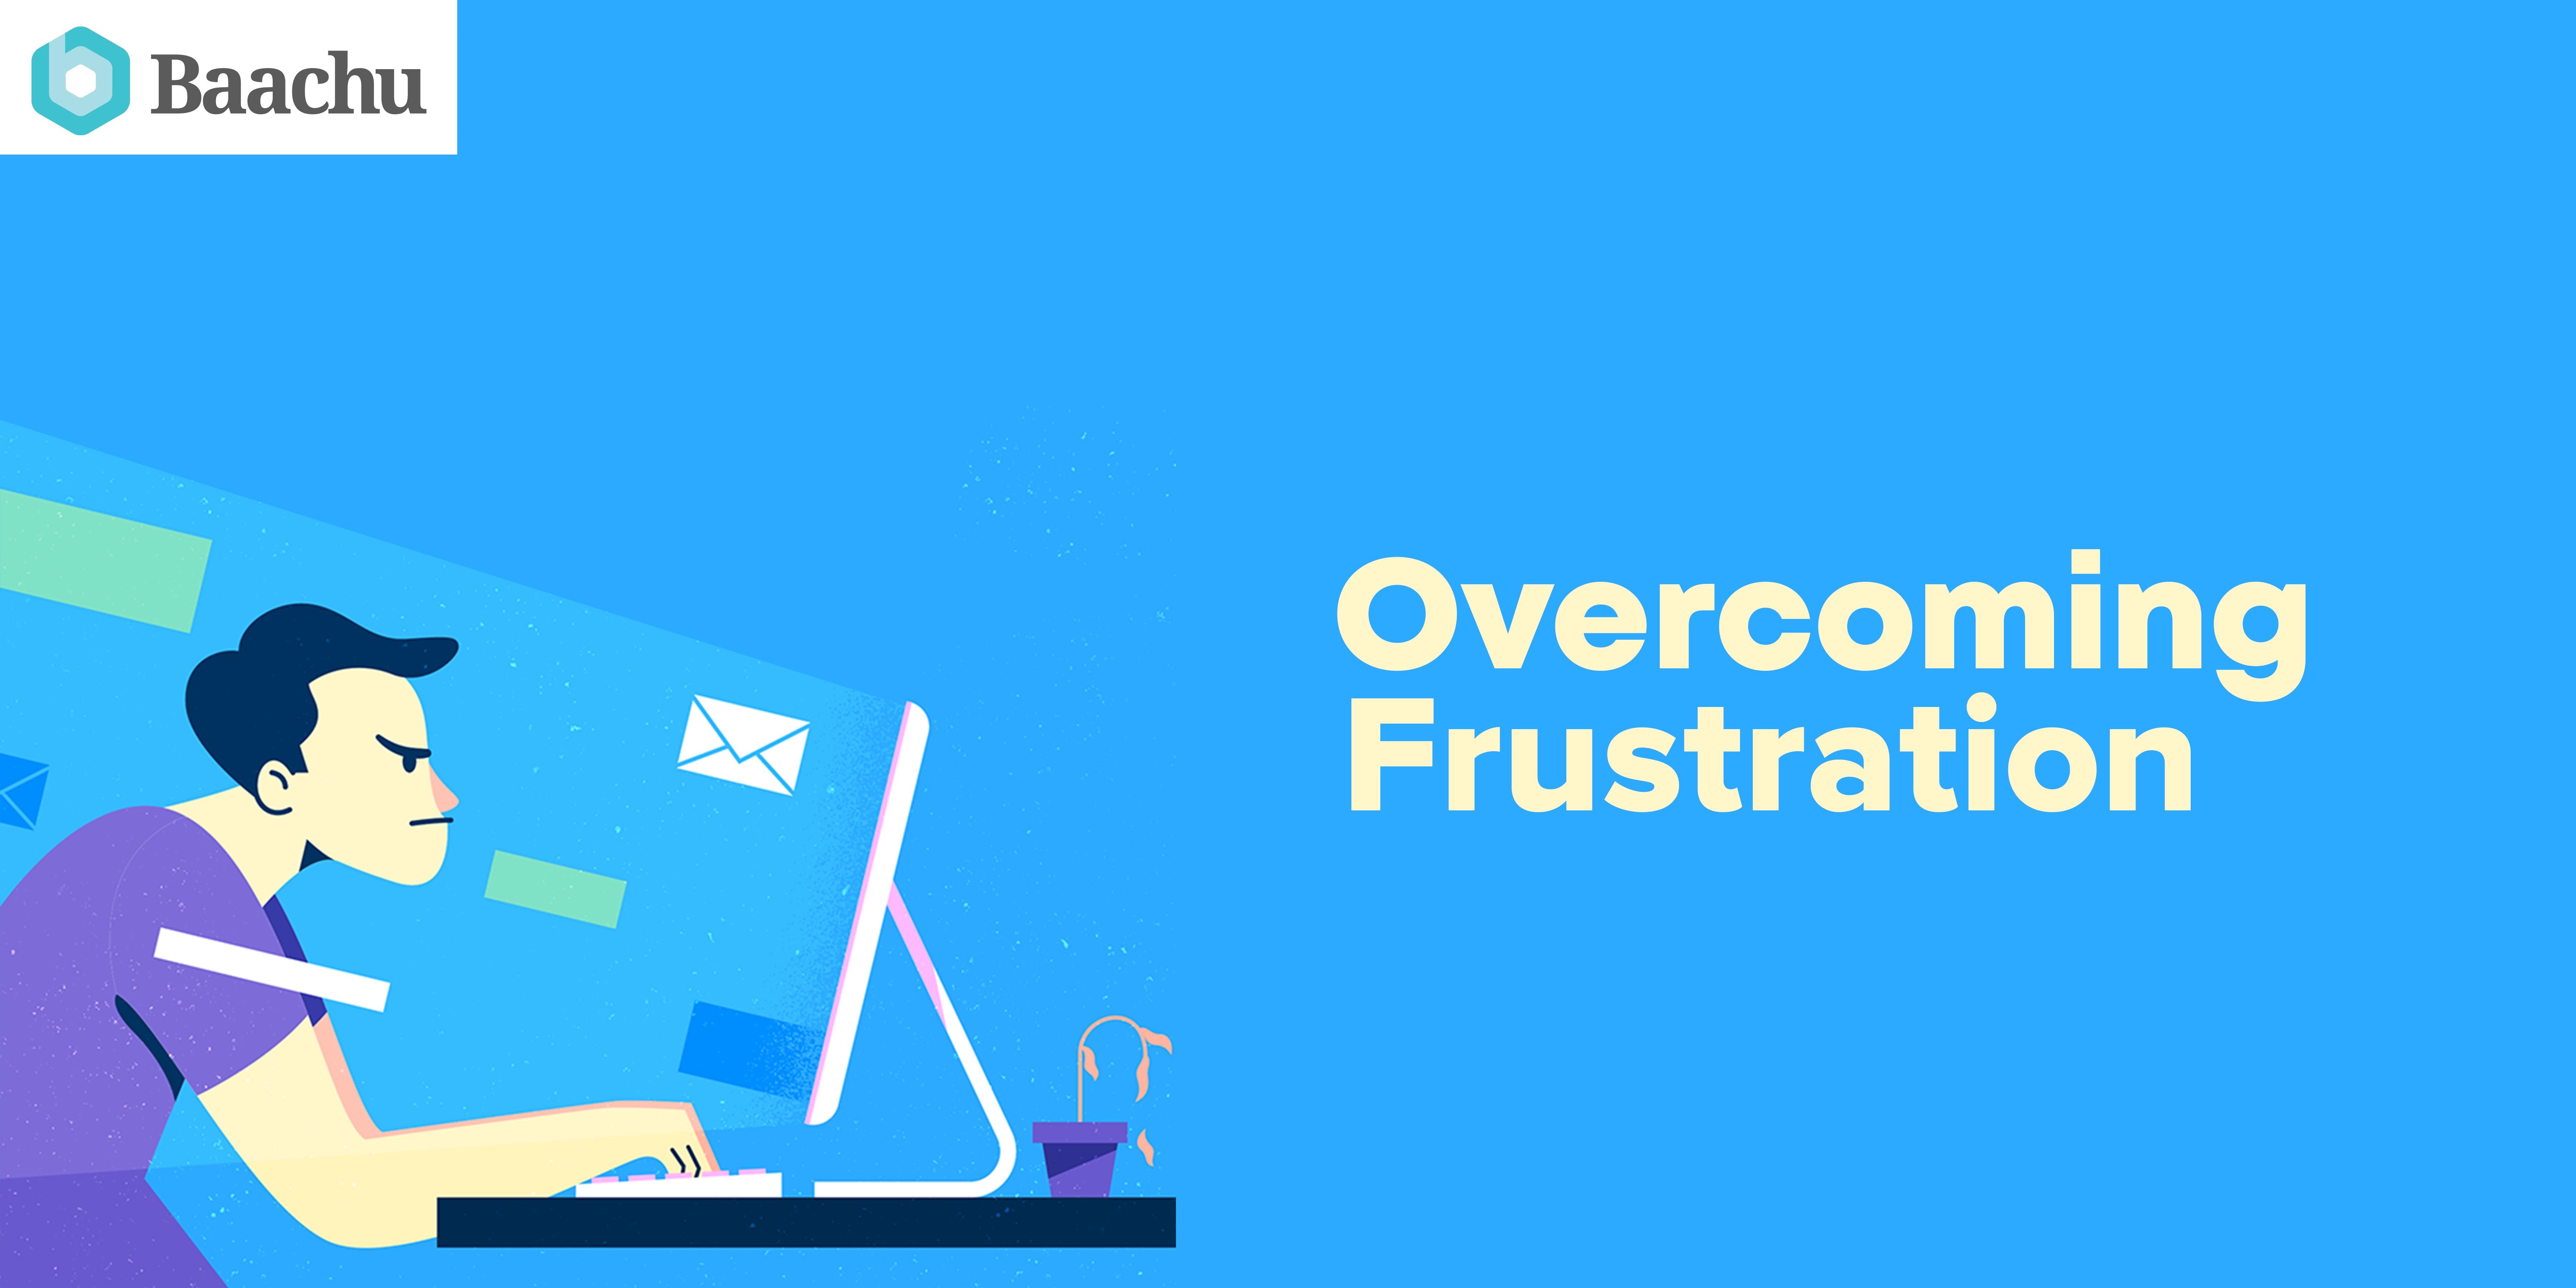 Overcoming Frustration